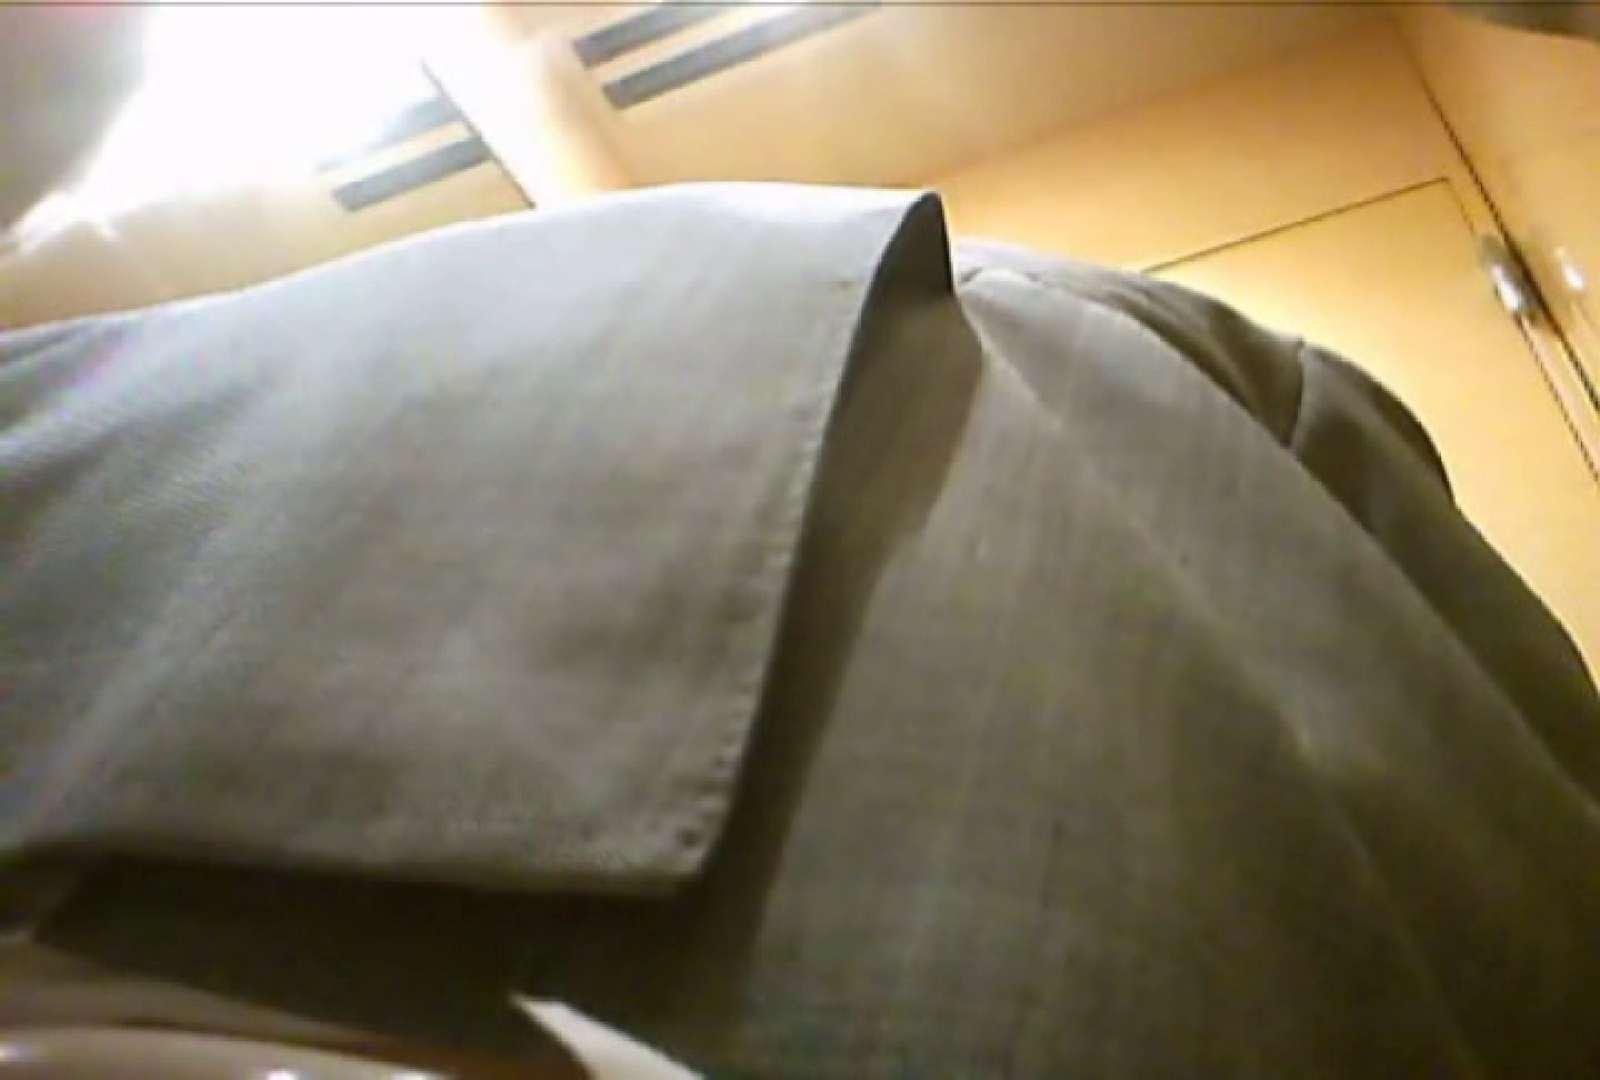 SEASON 2ND!掴み取りさんの洗面所覗き!in新幹線!VOL.02 スーツボーイズ | ノンケボーイズ  82pic 39